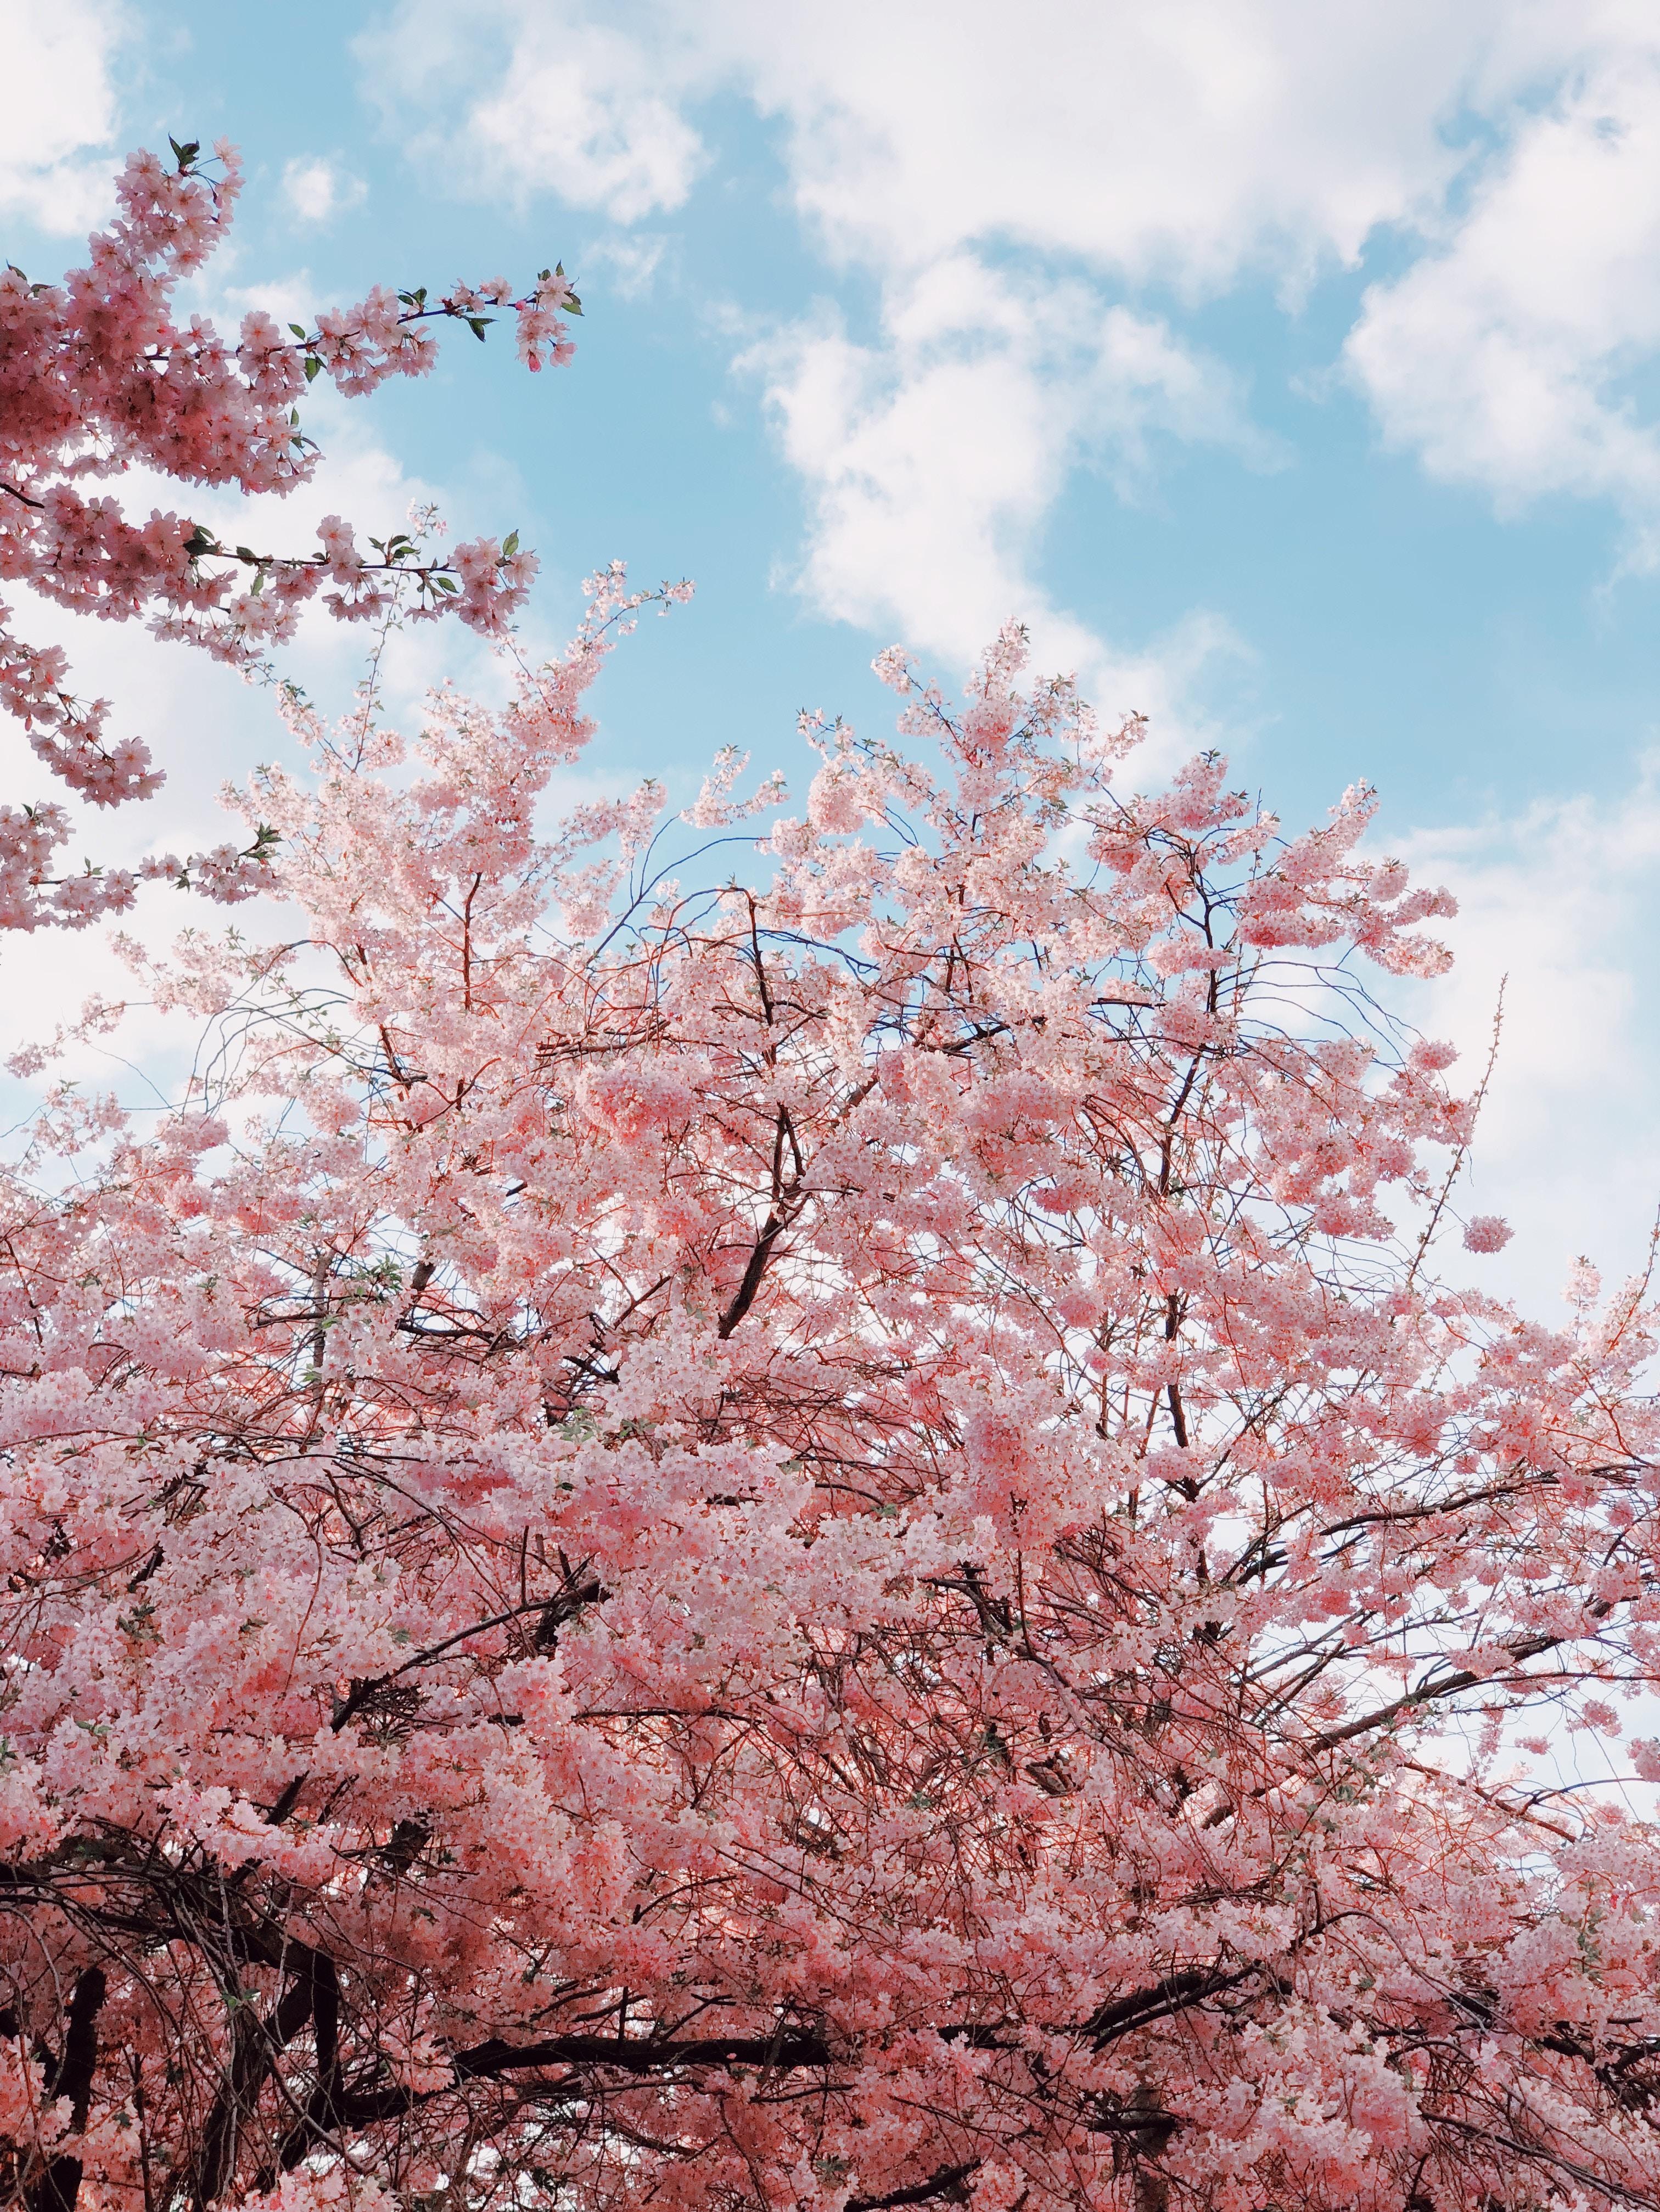 62796 Заставки и Обои Вишня на телефон. Скачать Цветы, Небо, Вишня, Ветки, Цветение, Весна картинки бесплатно